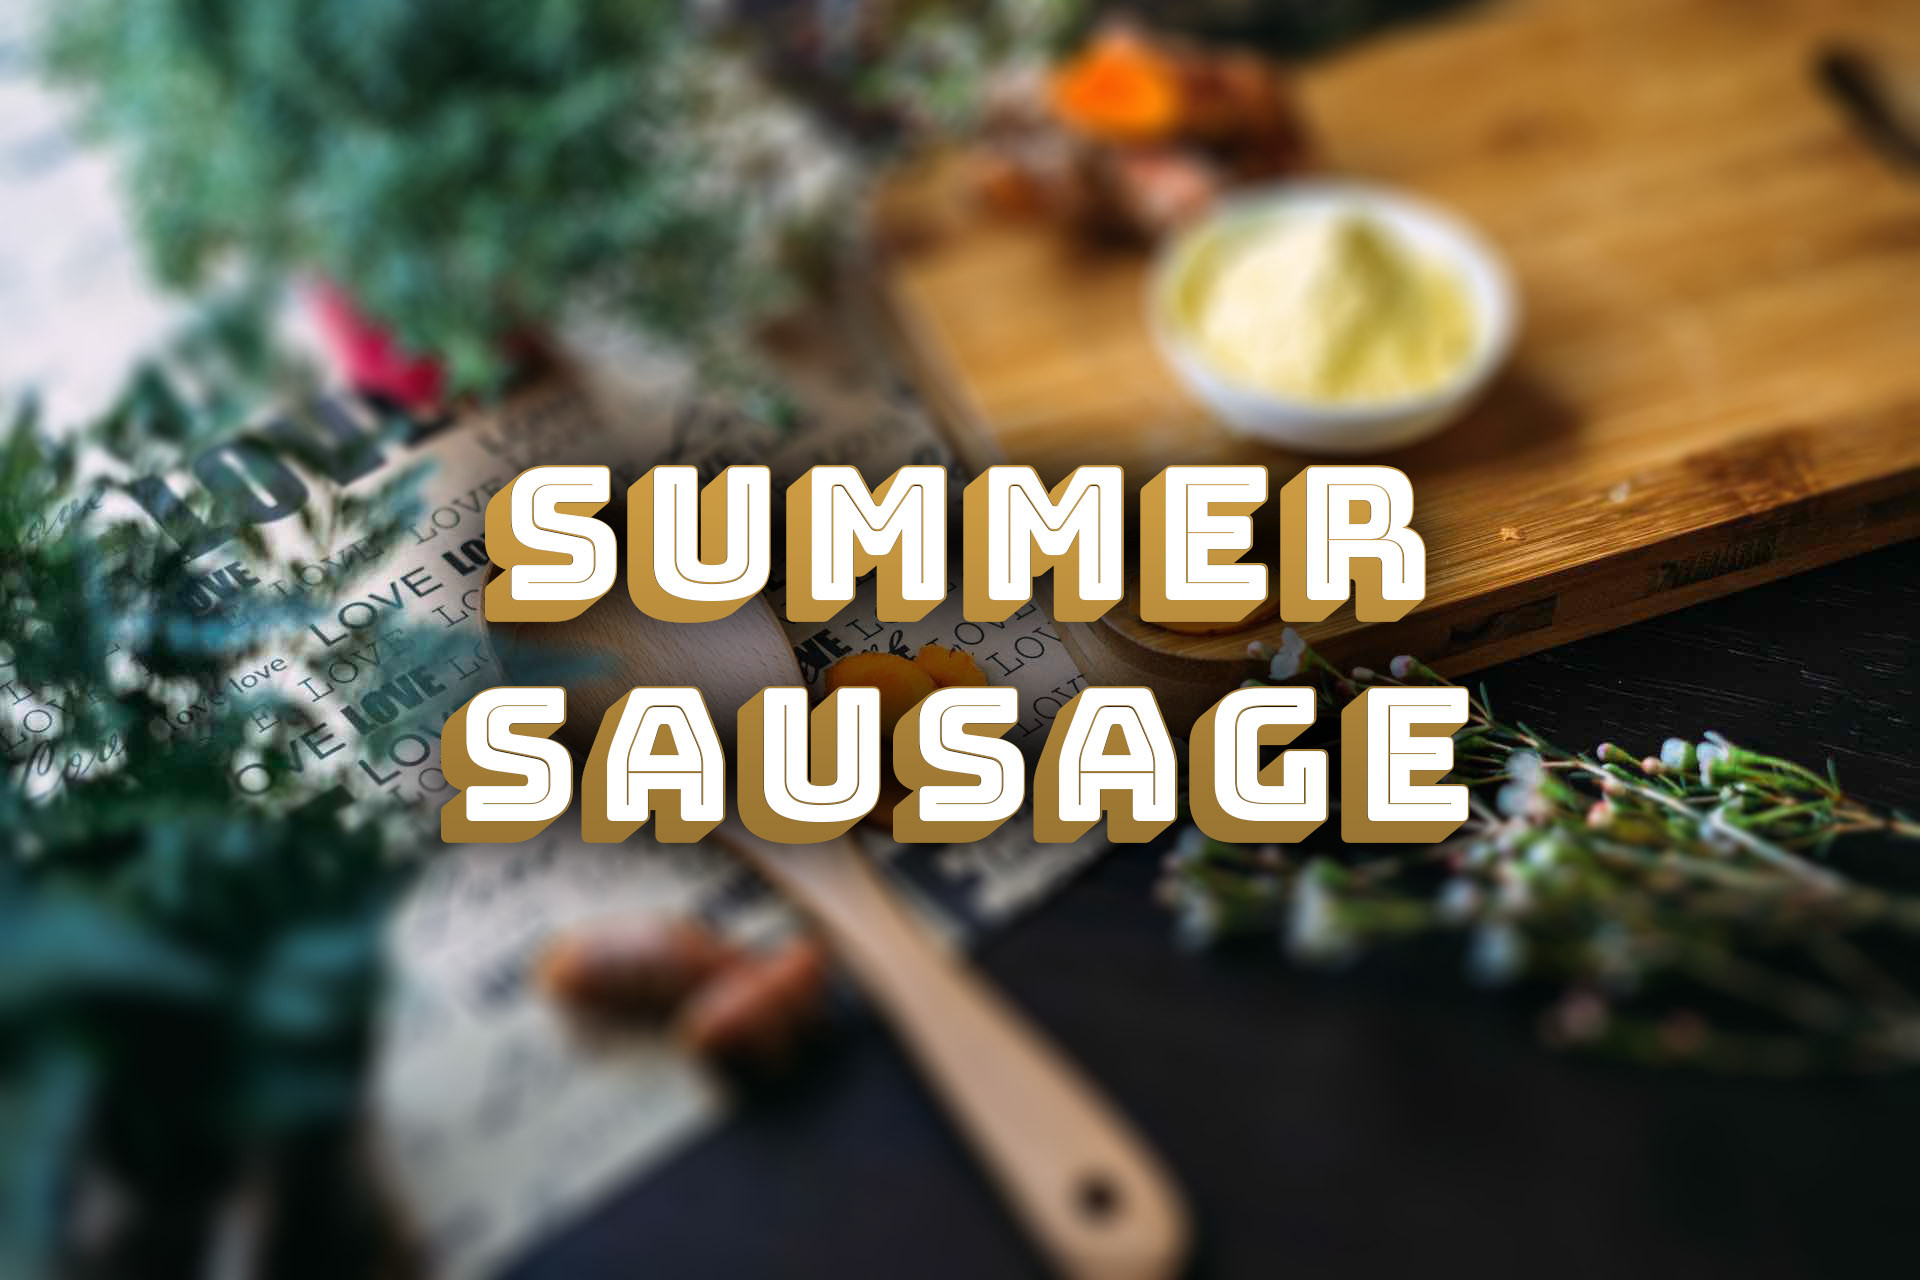 Summer Sausage - Jalapeno/Cheese